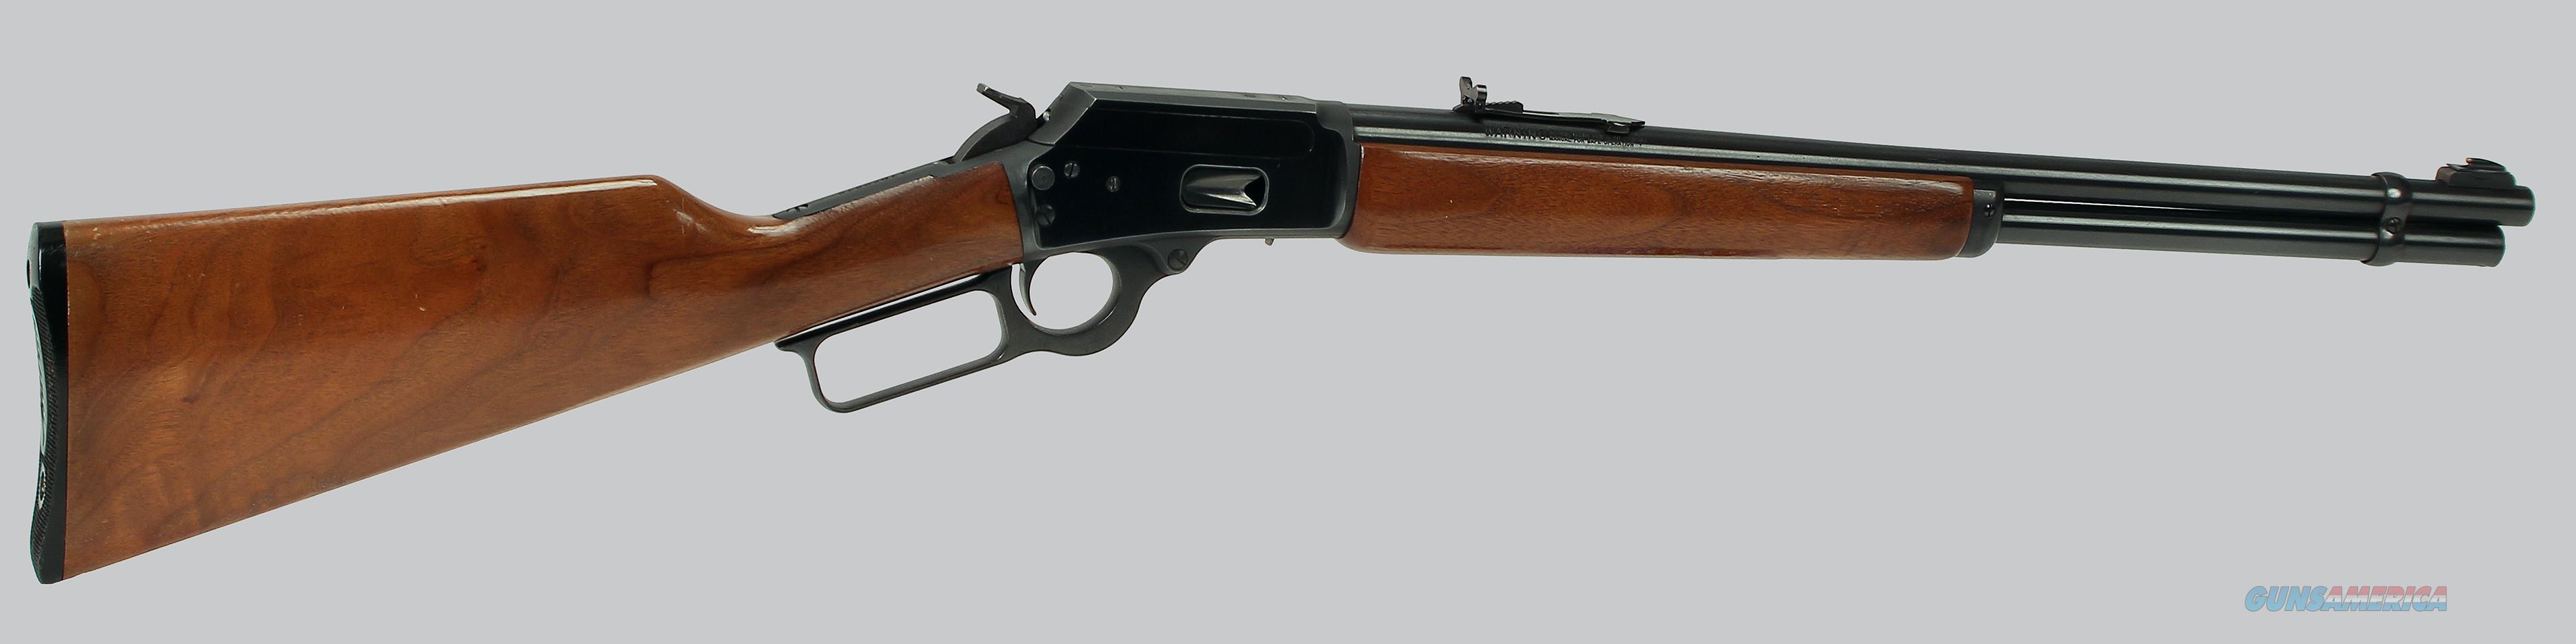 Marlin 1894S Lever Action 44 Magnum Rifle  Guns > Rifles > Marlin Rifles > Modern > Lever Action